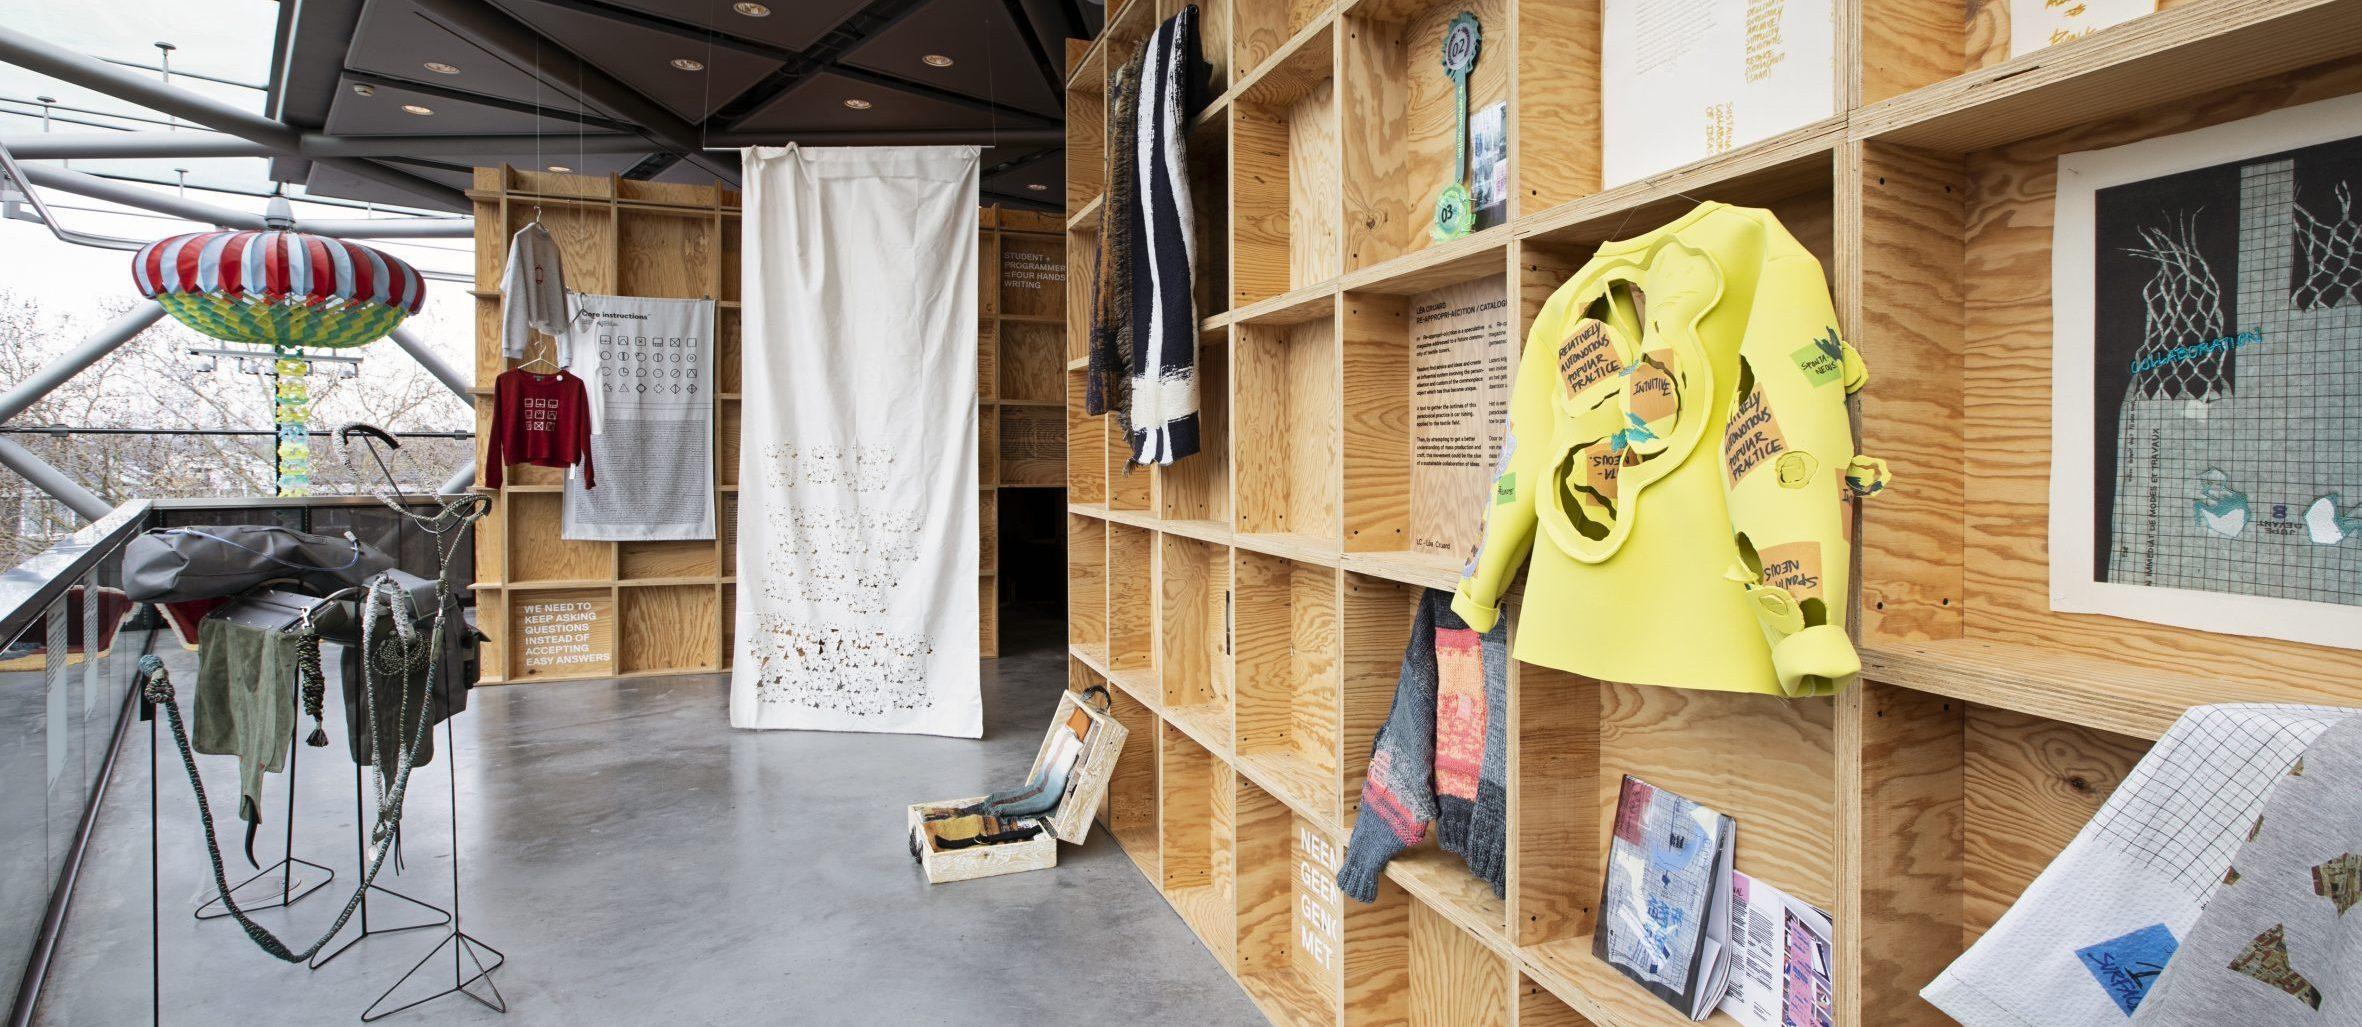 Minor Design Academy Eidhoven. Foto: Josefina Eikenaar